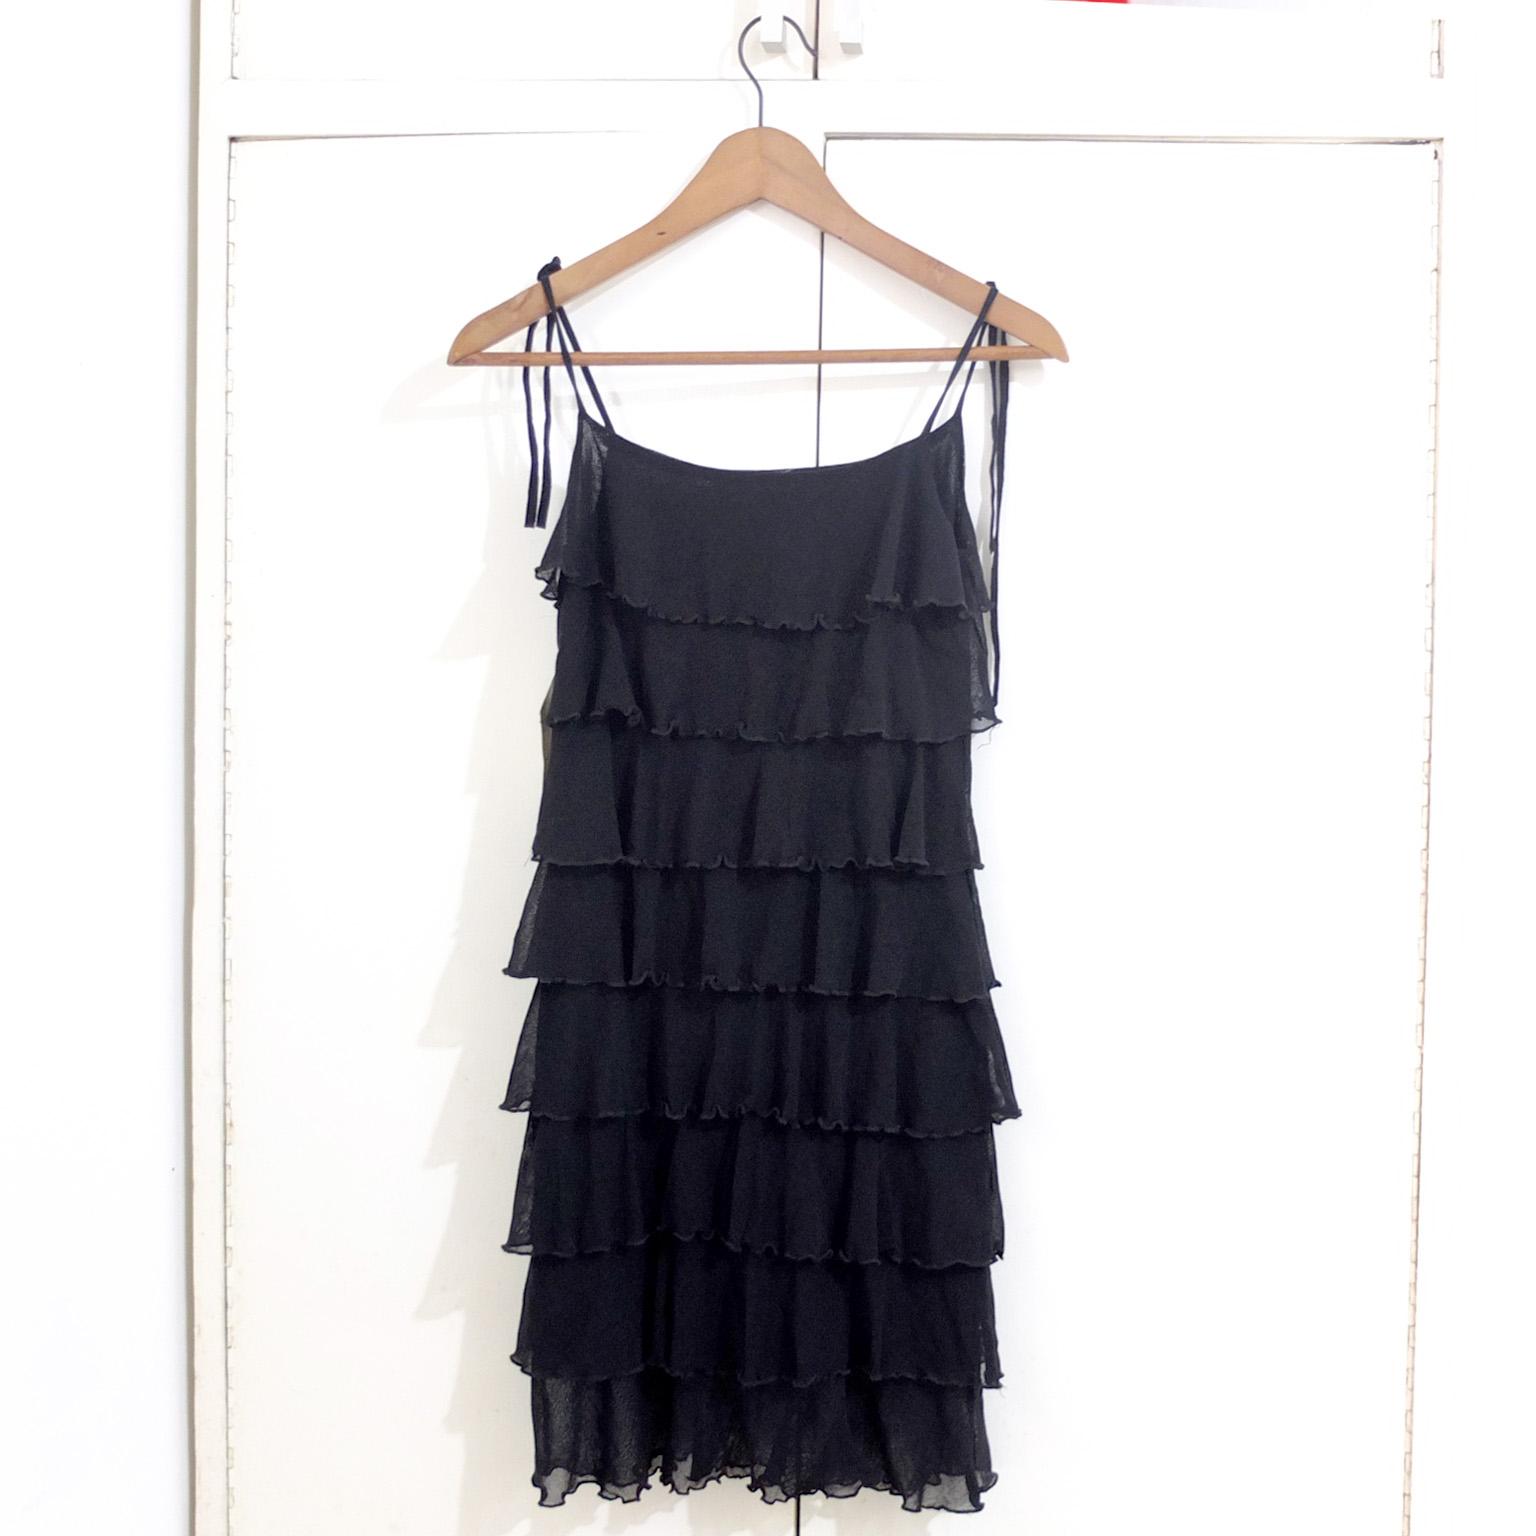 Layered Little Black Cocktail Formal Dress